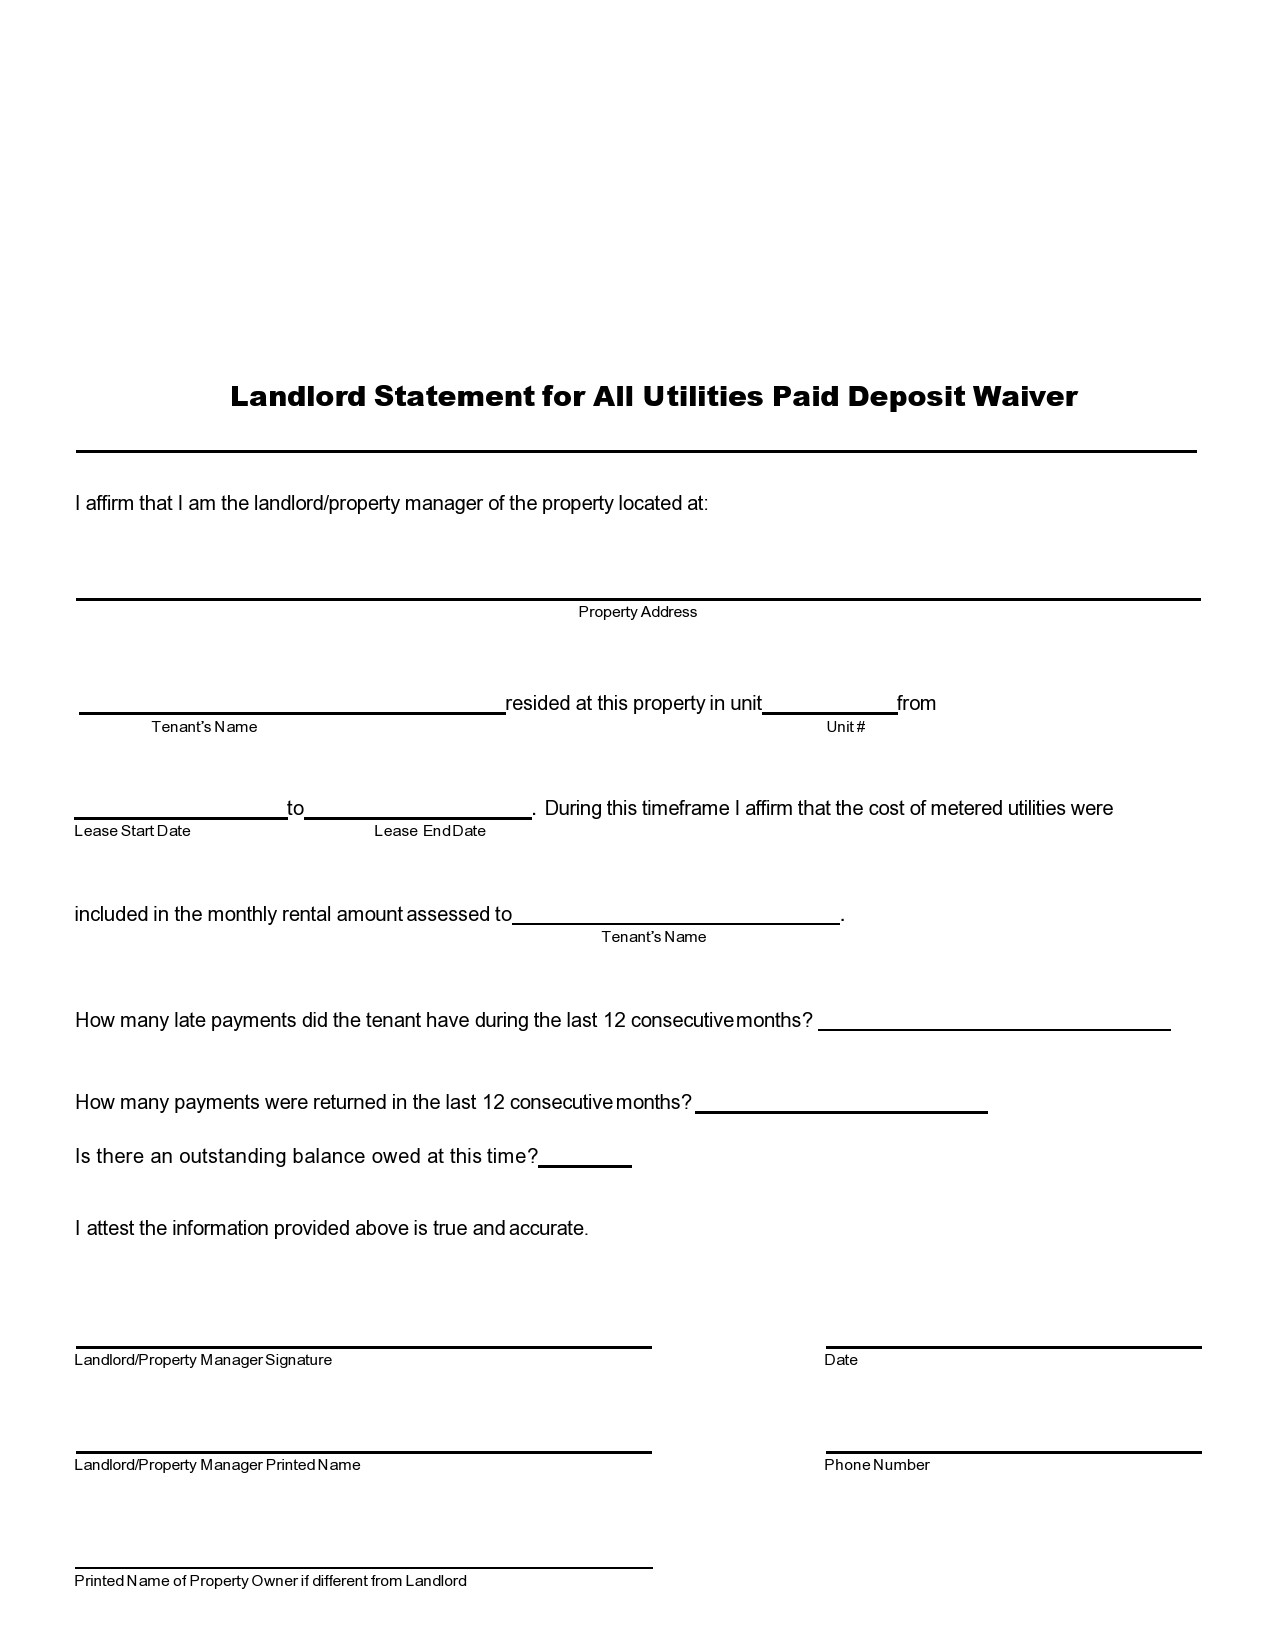 Free landlord statment 37